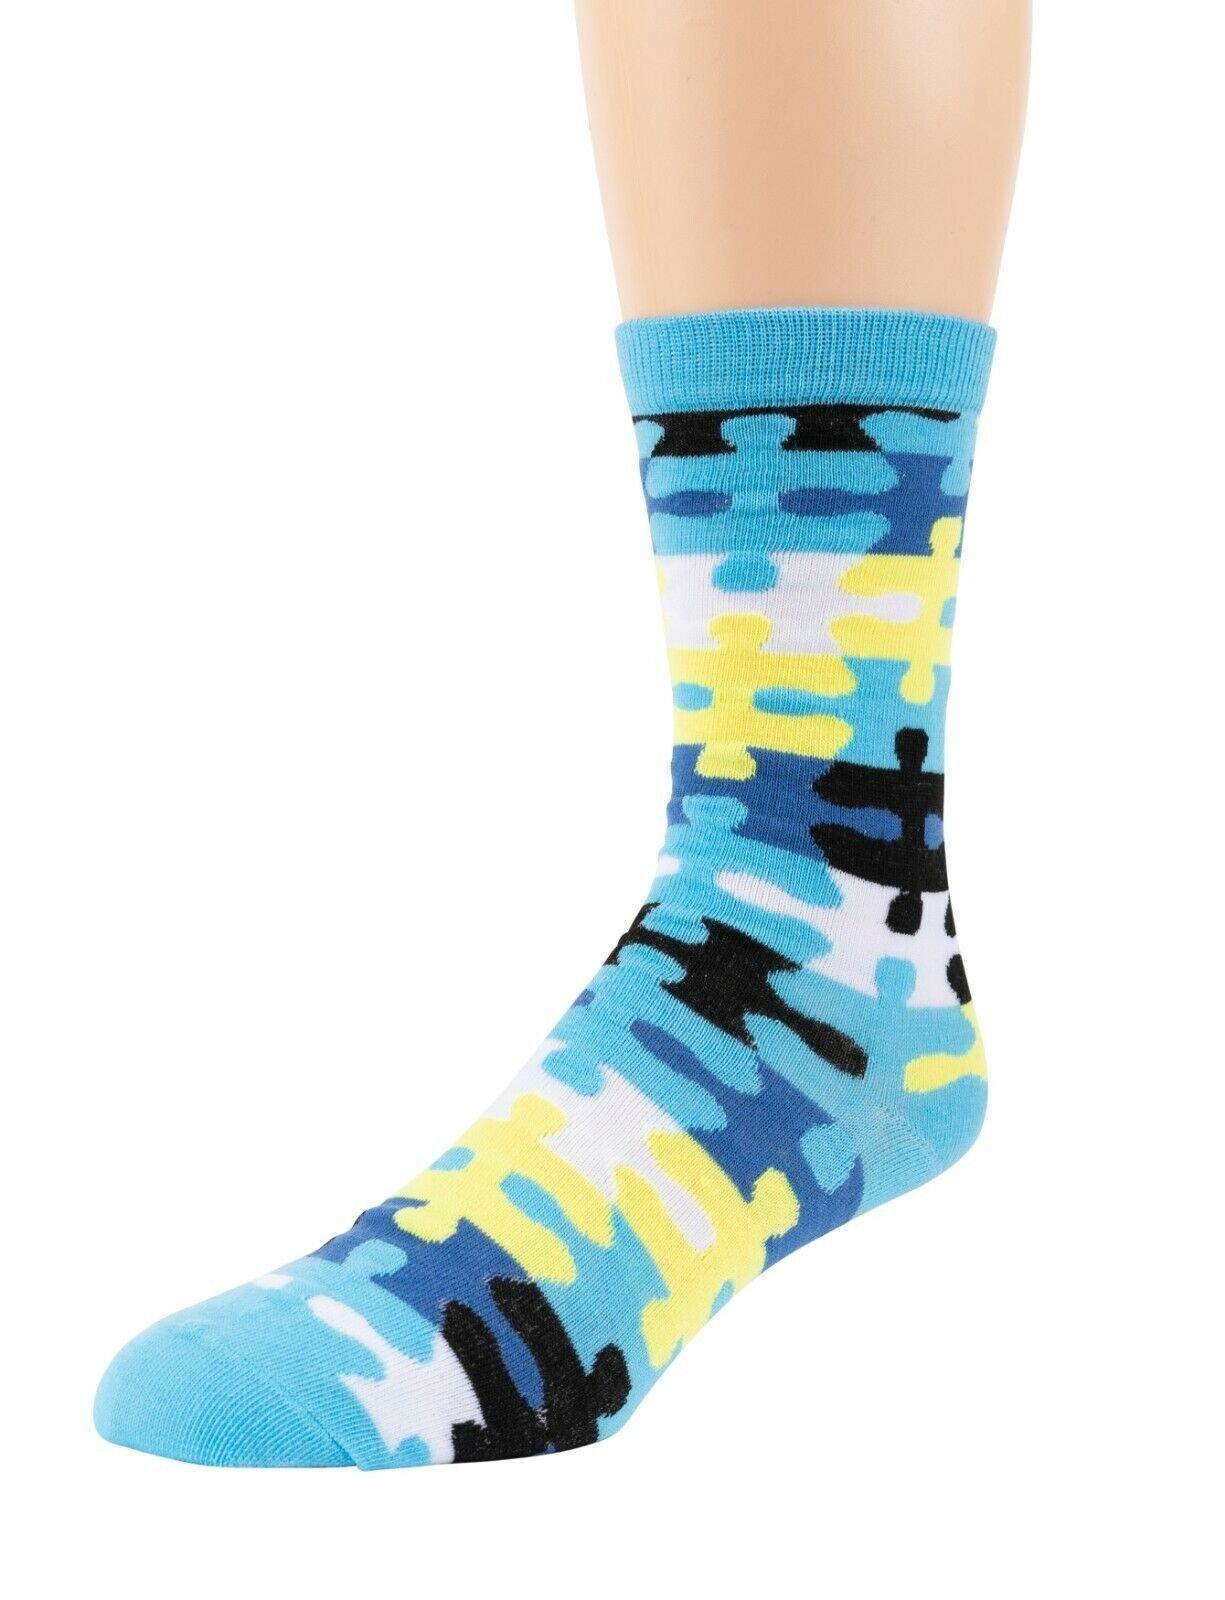 Mitch-Bogen-Mens-Cotton-Dress-Socks-Colorful-Fashion-Crew-Socks-8-Pack-Gift-Box thumbnail 16